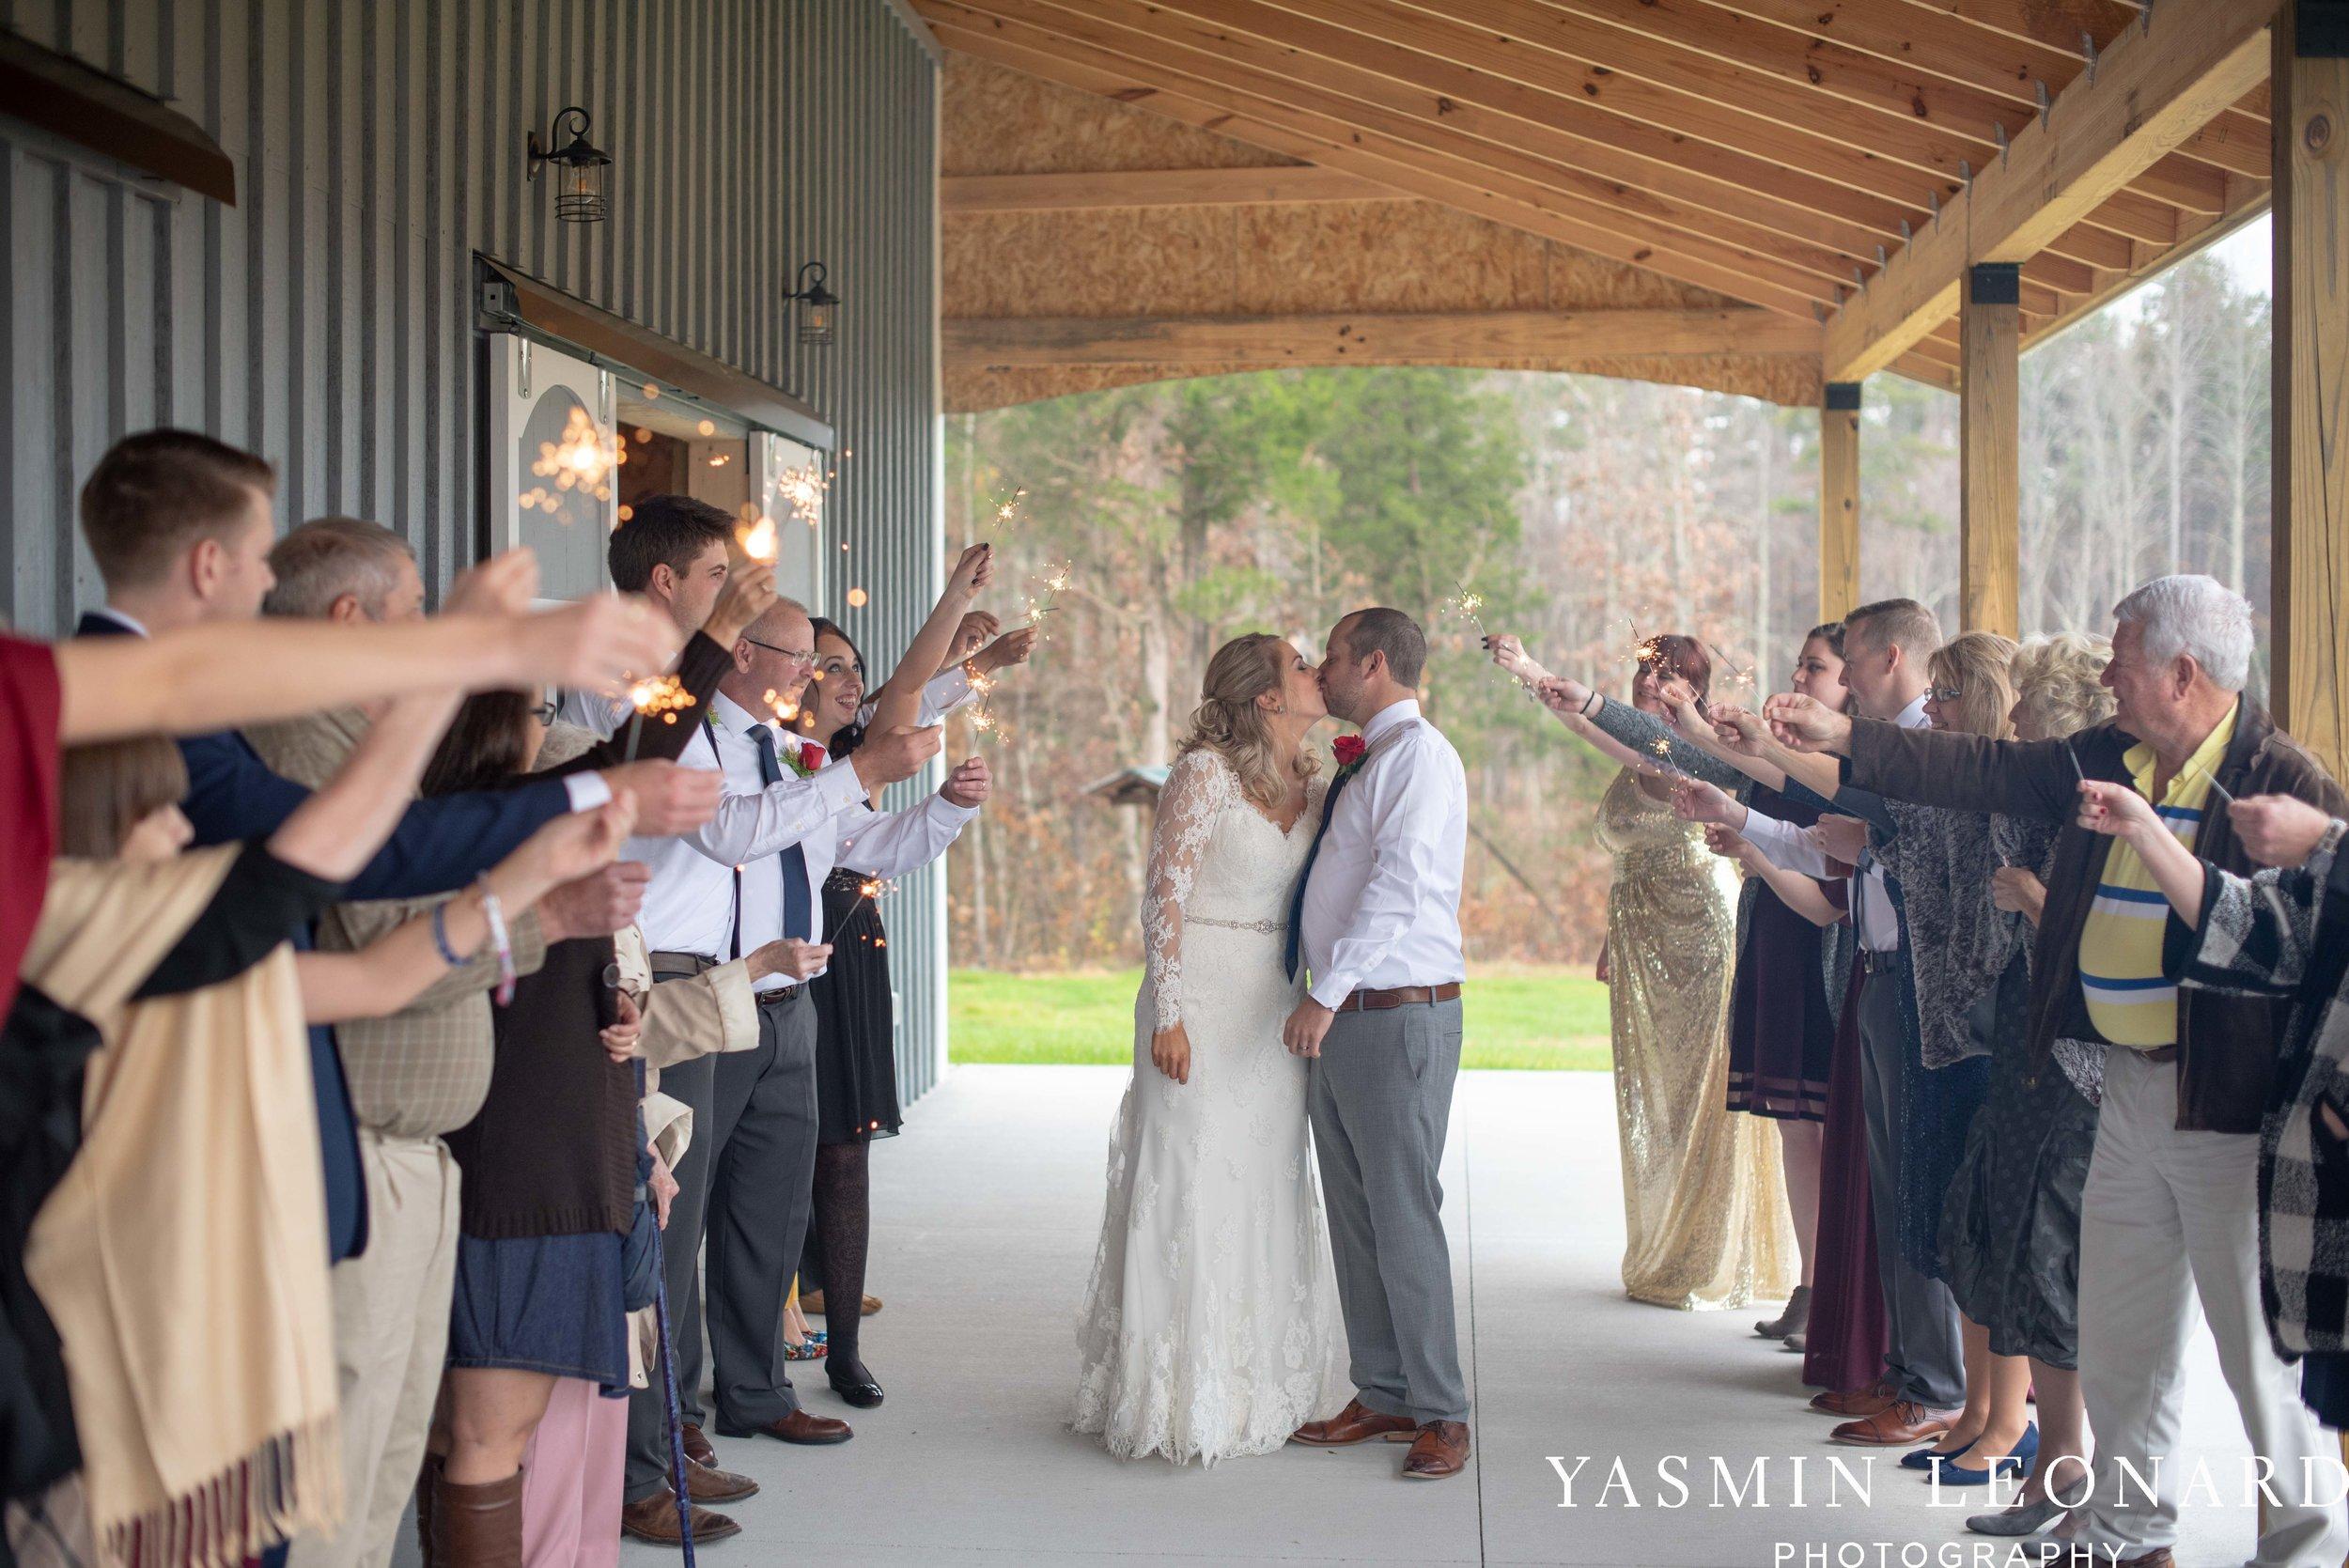 Secret Meadows at Green Dell Farm, NC Barns, NC Wedding Venues, Triad, NC, NC Wedding Photography, Triad Wedding Venues, Affordable Wedding Venues, NEW Wedding Venues, Christmas Weddings-43.jpg